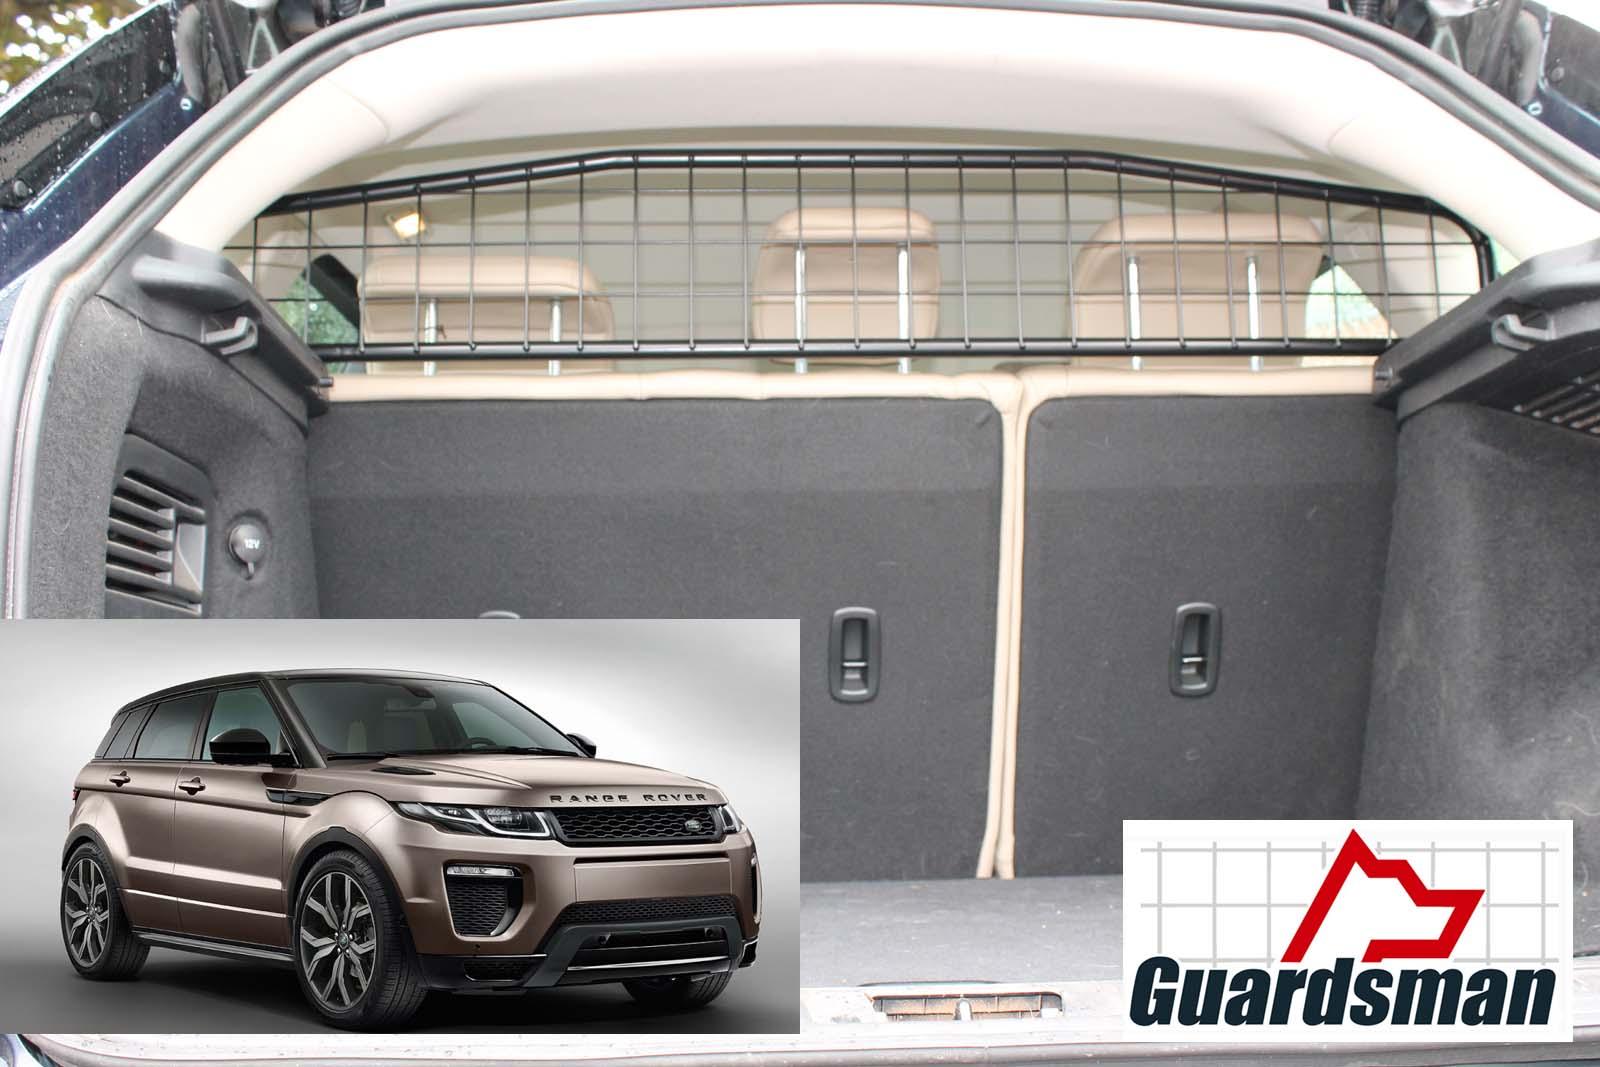 Range Rover Evoque >> Guardsman - Range Rover Evoque 5 door DOG GUARD (2011-2018 ...